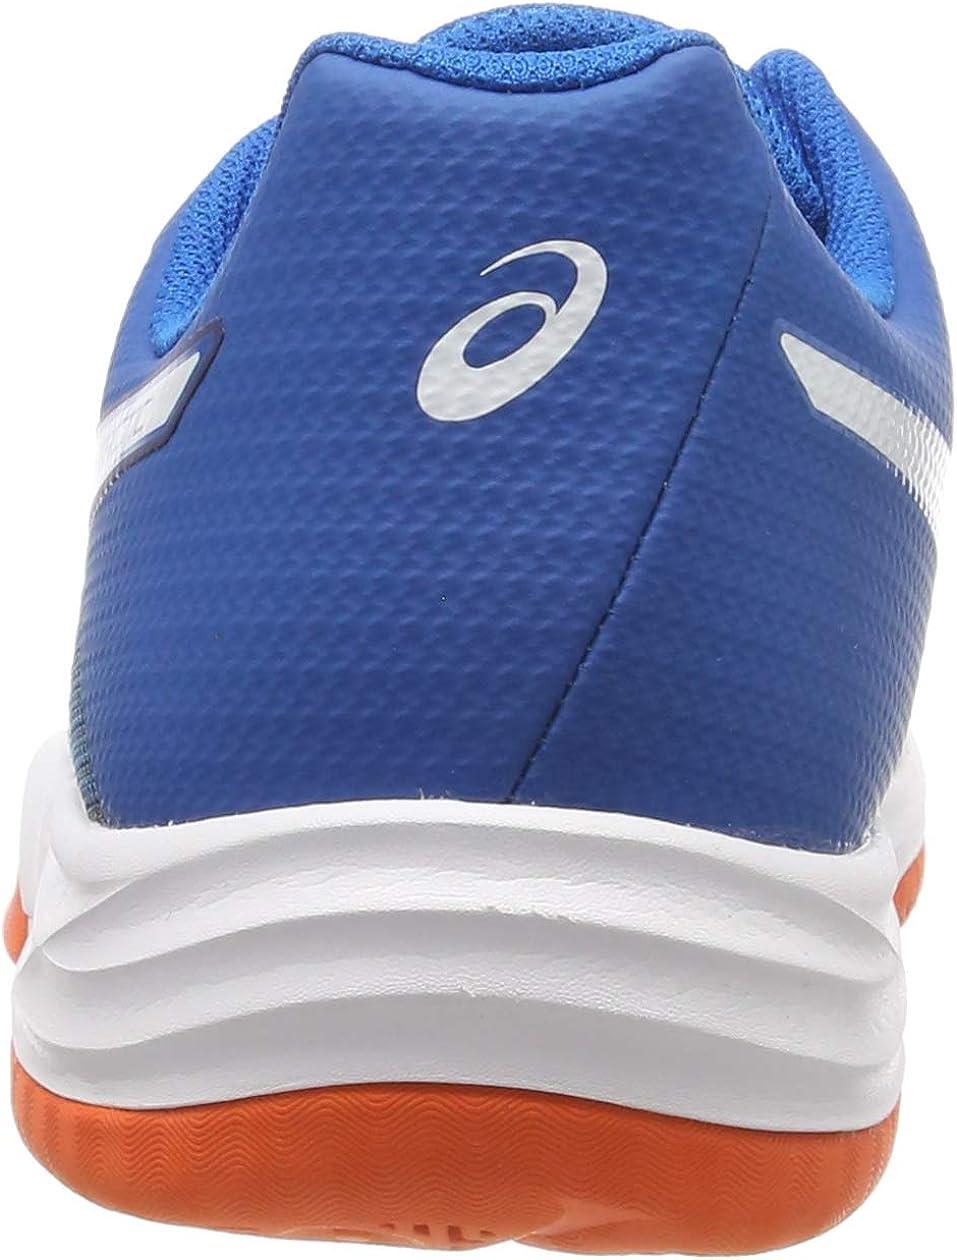 Chaussures de Volleyball Homme ASICS Volleyballschuh Gel-Tactic